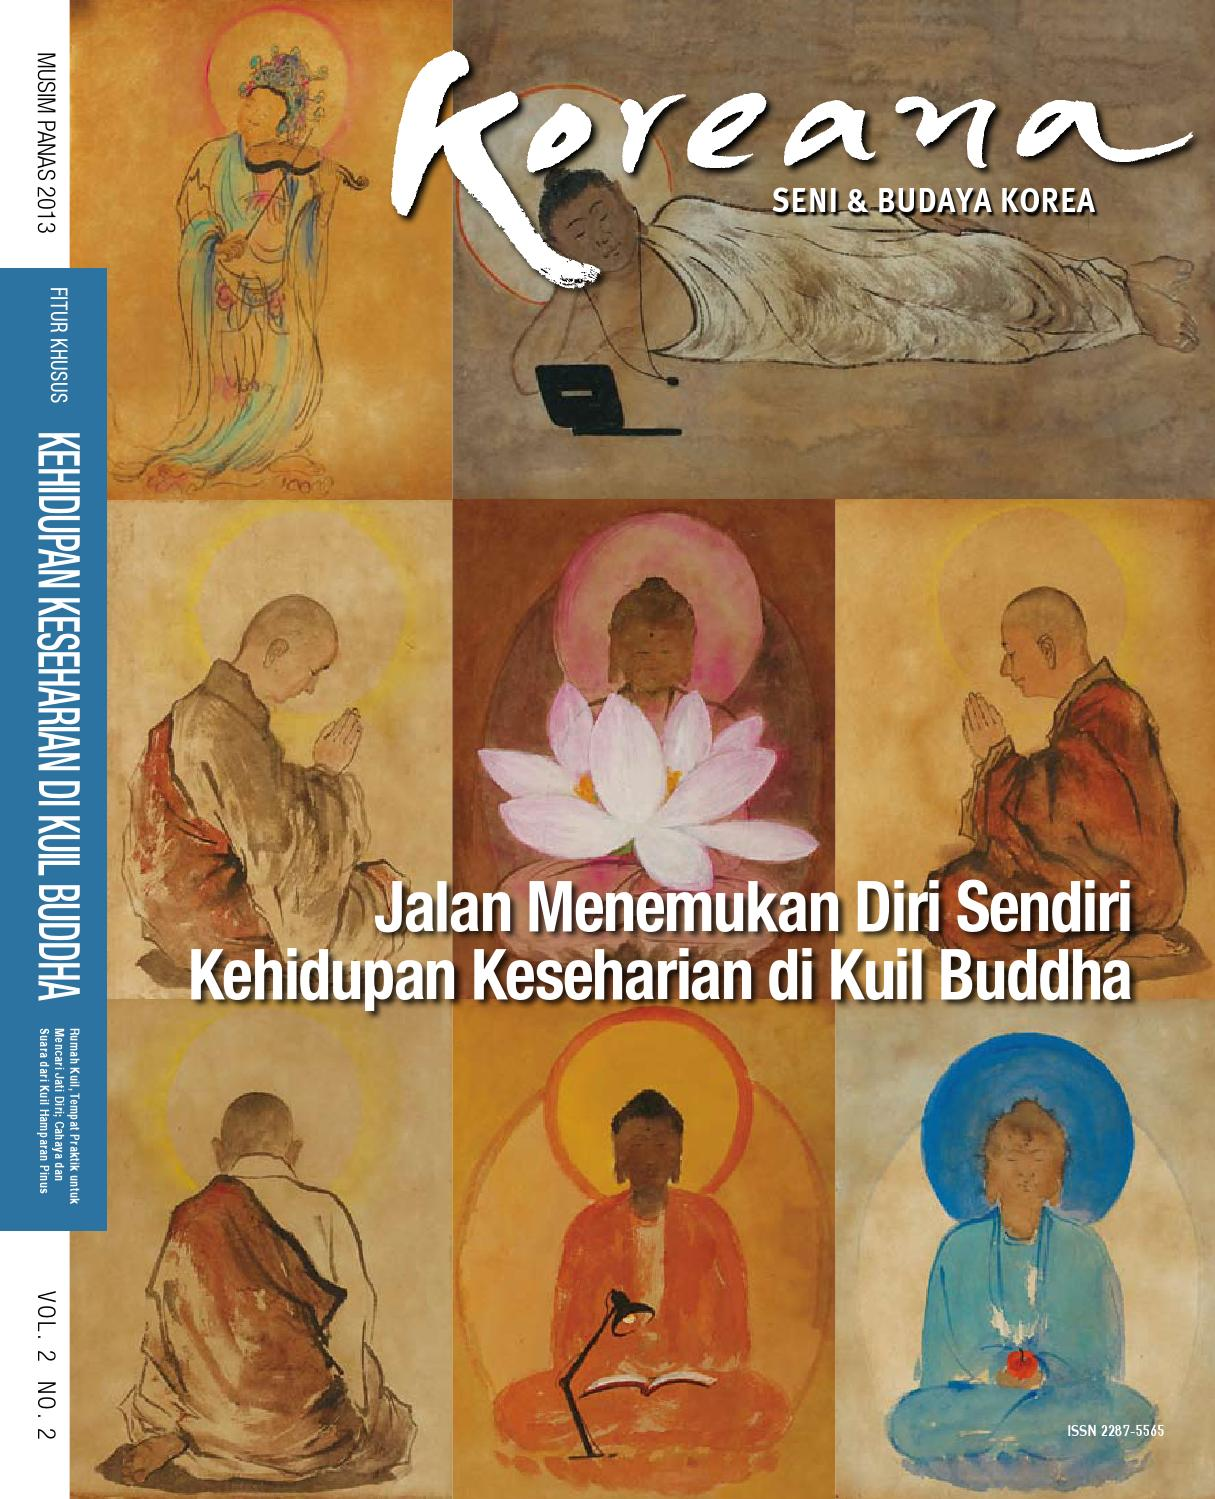 Koreana Summer 2013 Indonesian By The Korea Foundation Issuu